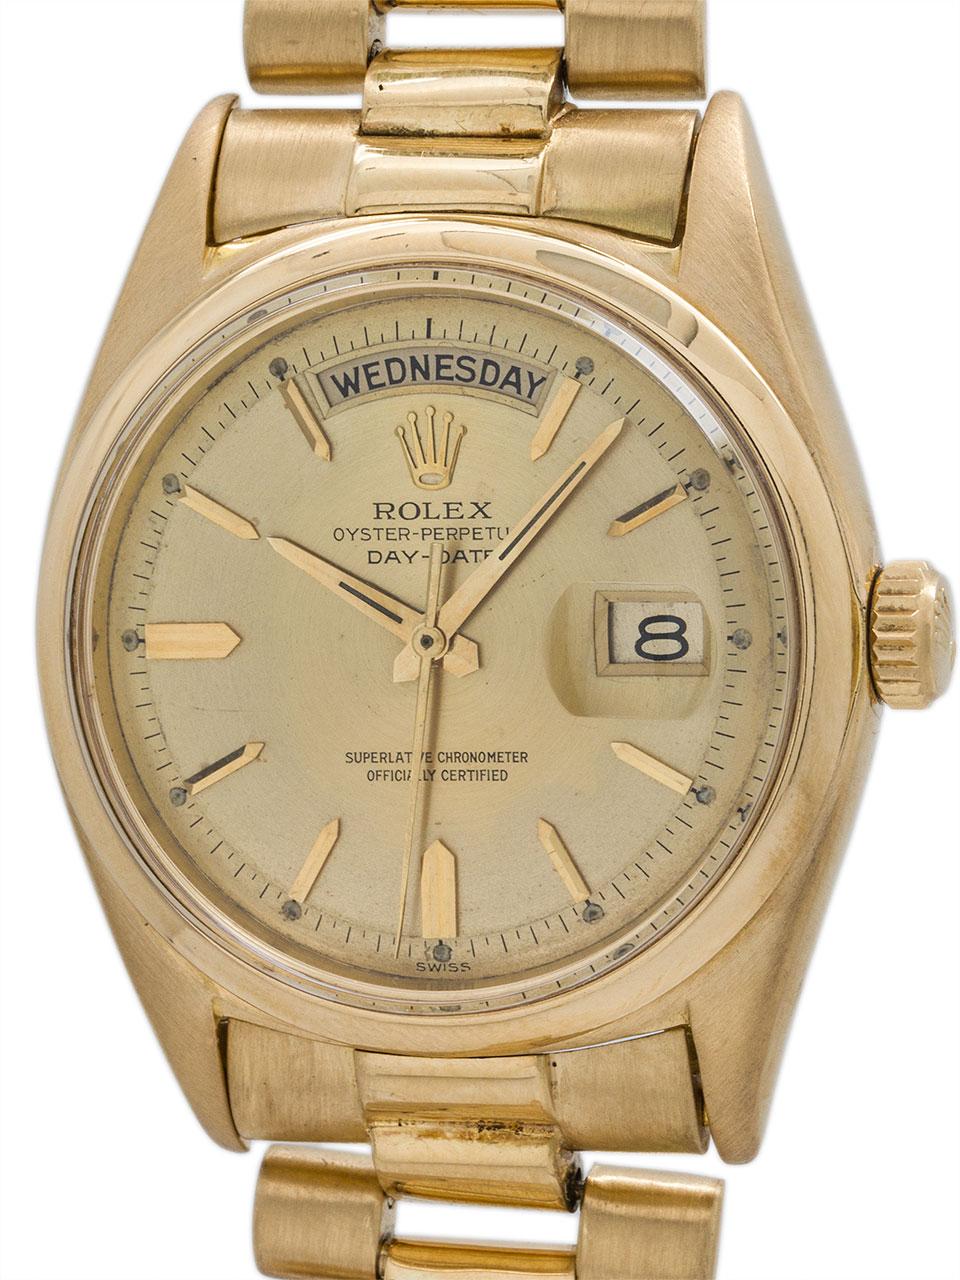 Rolex Day Date President ref 1802 18K YG circa 1963